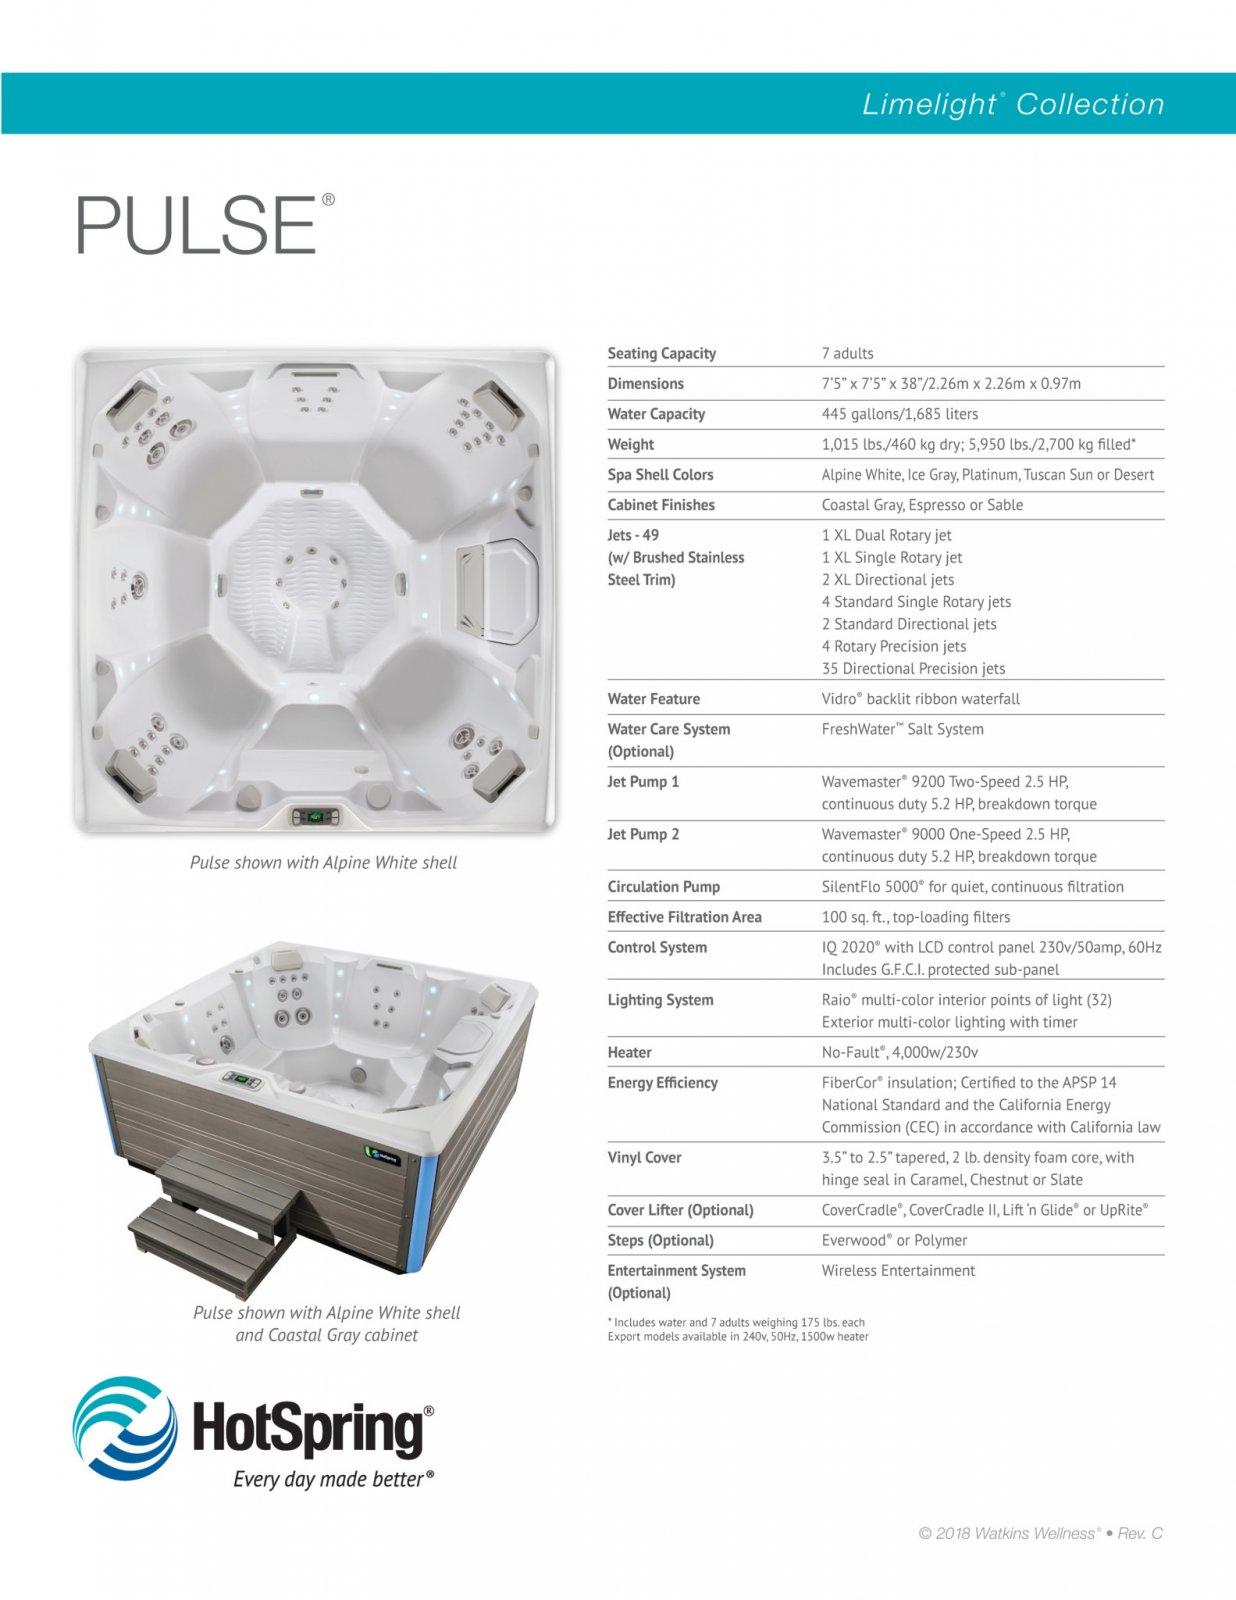 HotSpring Limelight Pulse specs